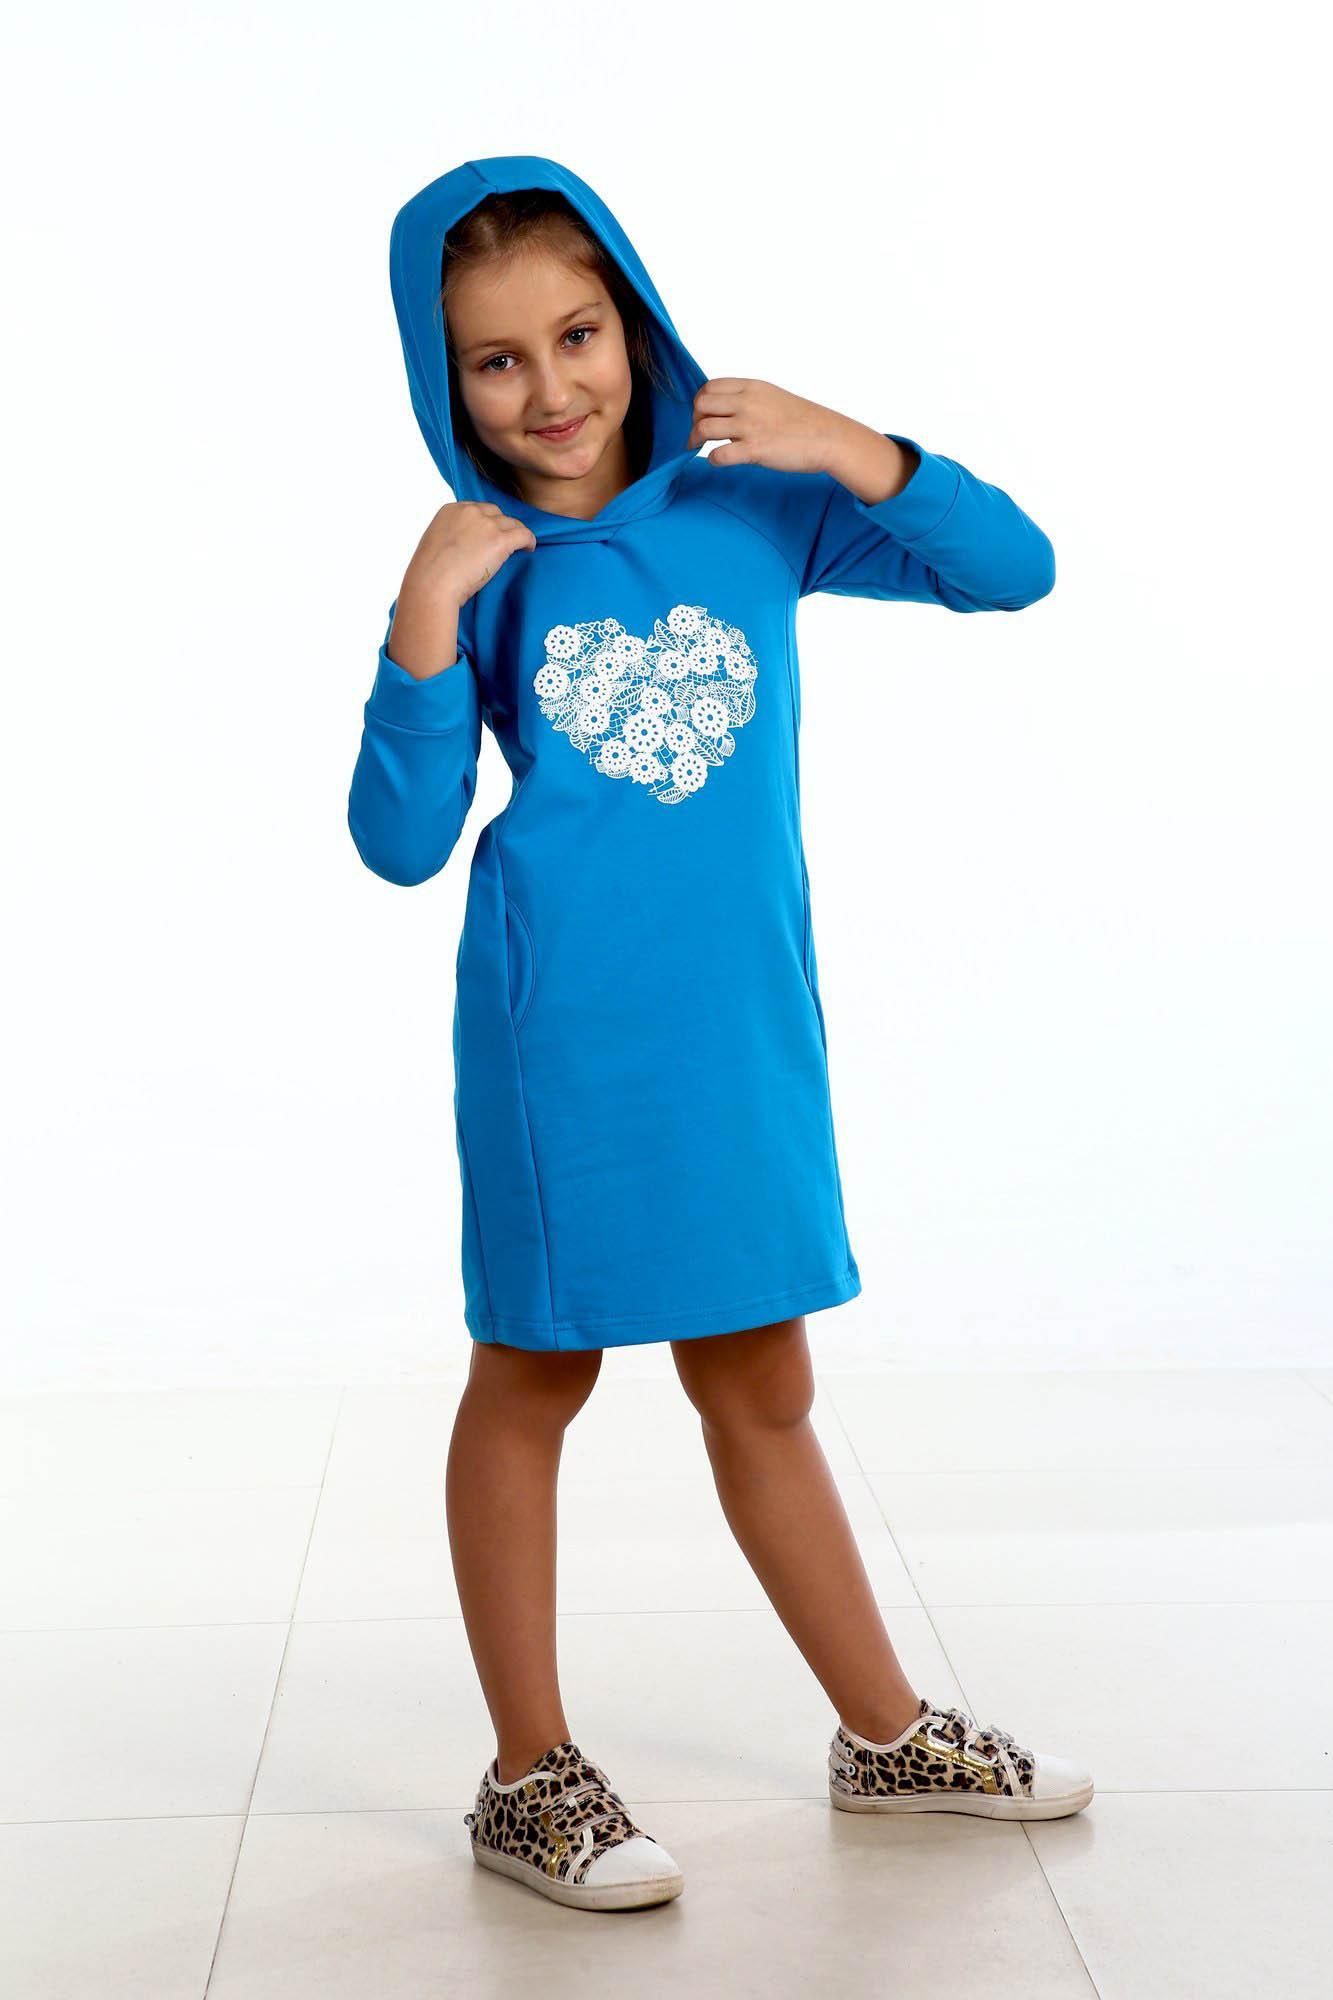 Детские туники, сарафаны Pastilla Туника Сердечко Цвет: Бирюза (7 лет) купить часы мальчику 7 лет